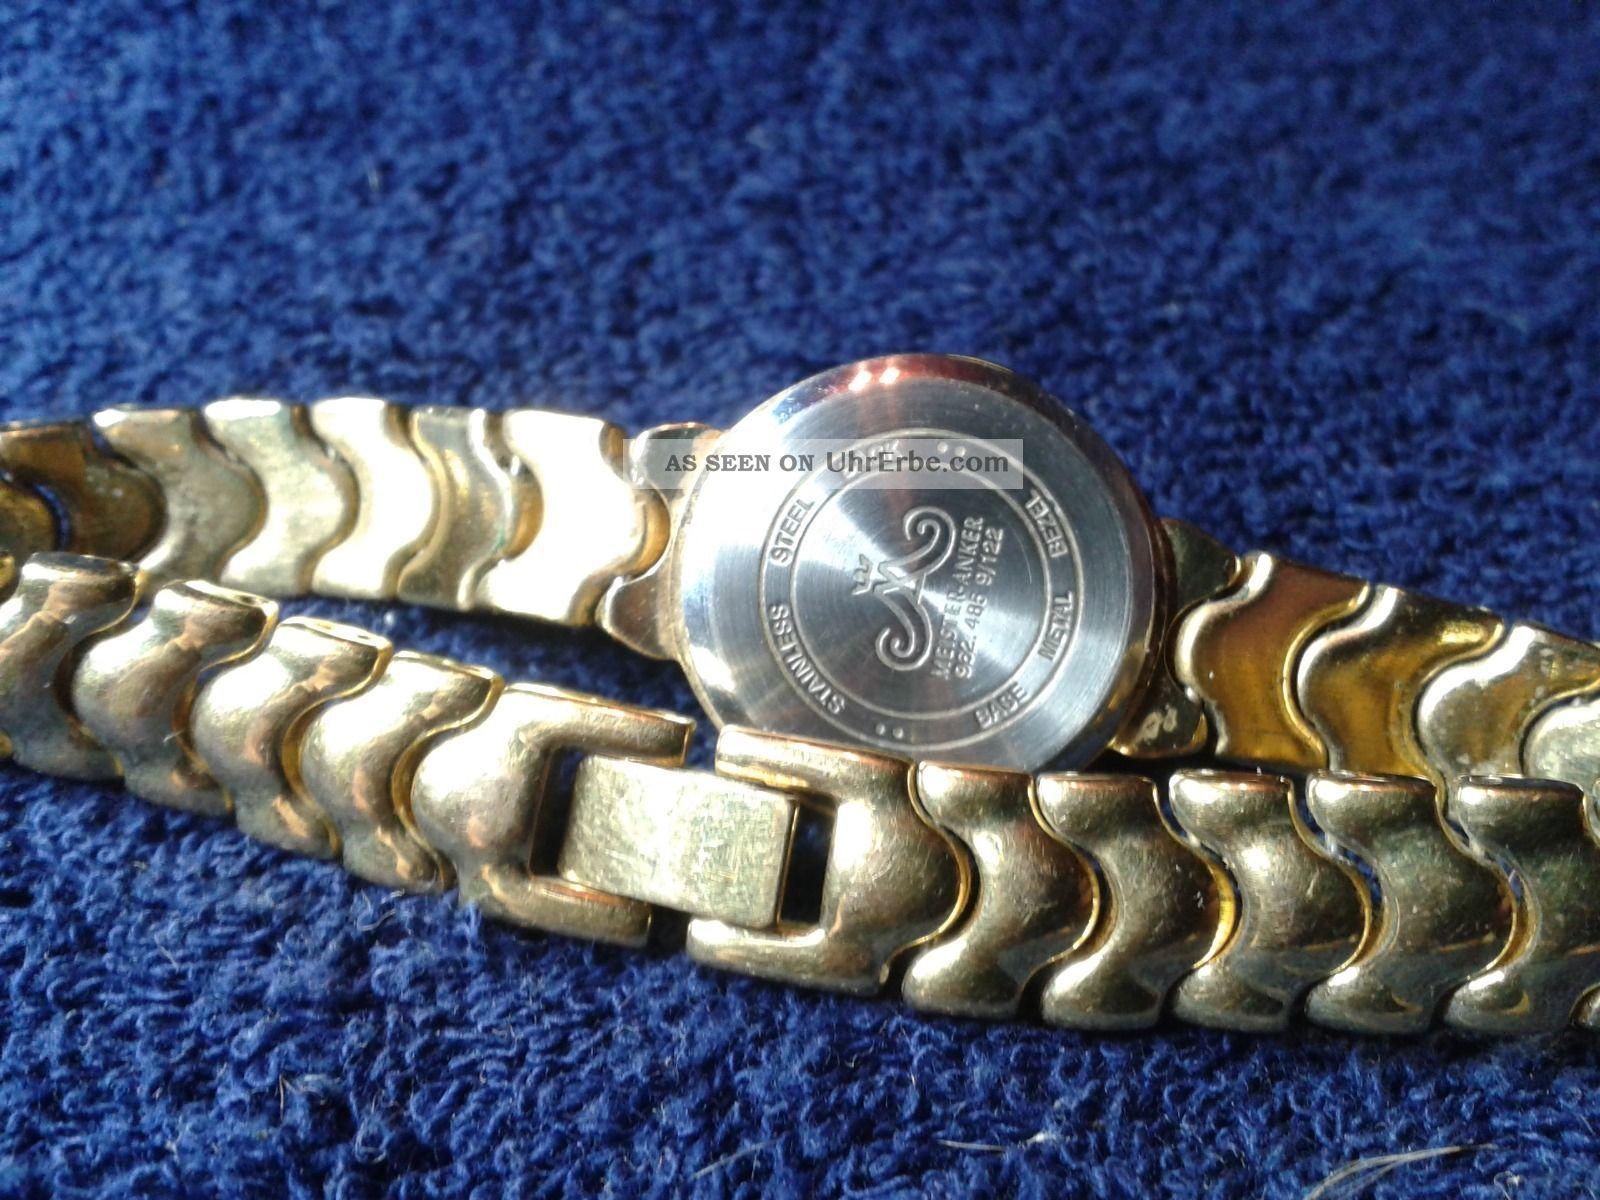 Damenuhr Meiste - Anker Quarz Analog Armbanduhren Bild